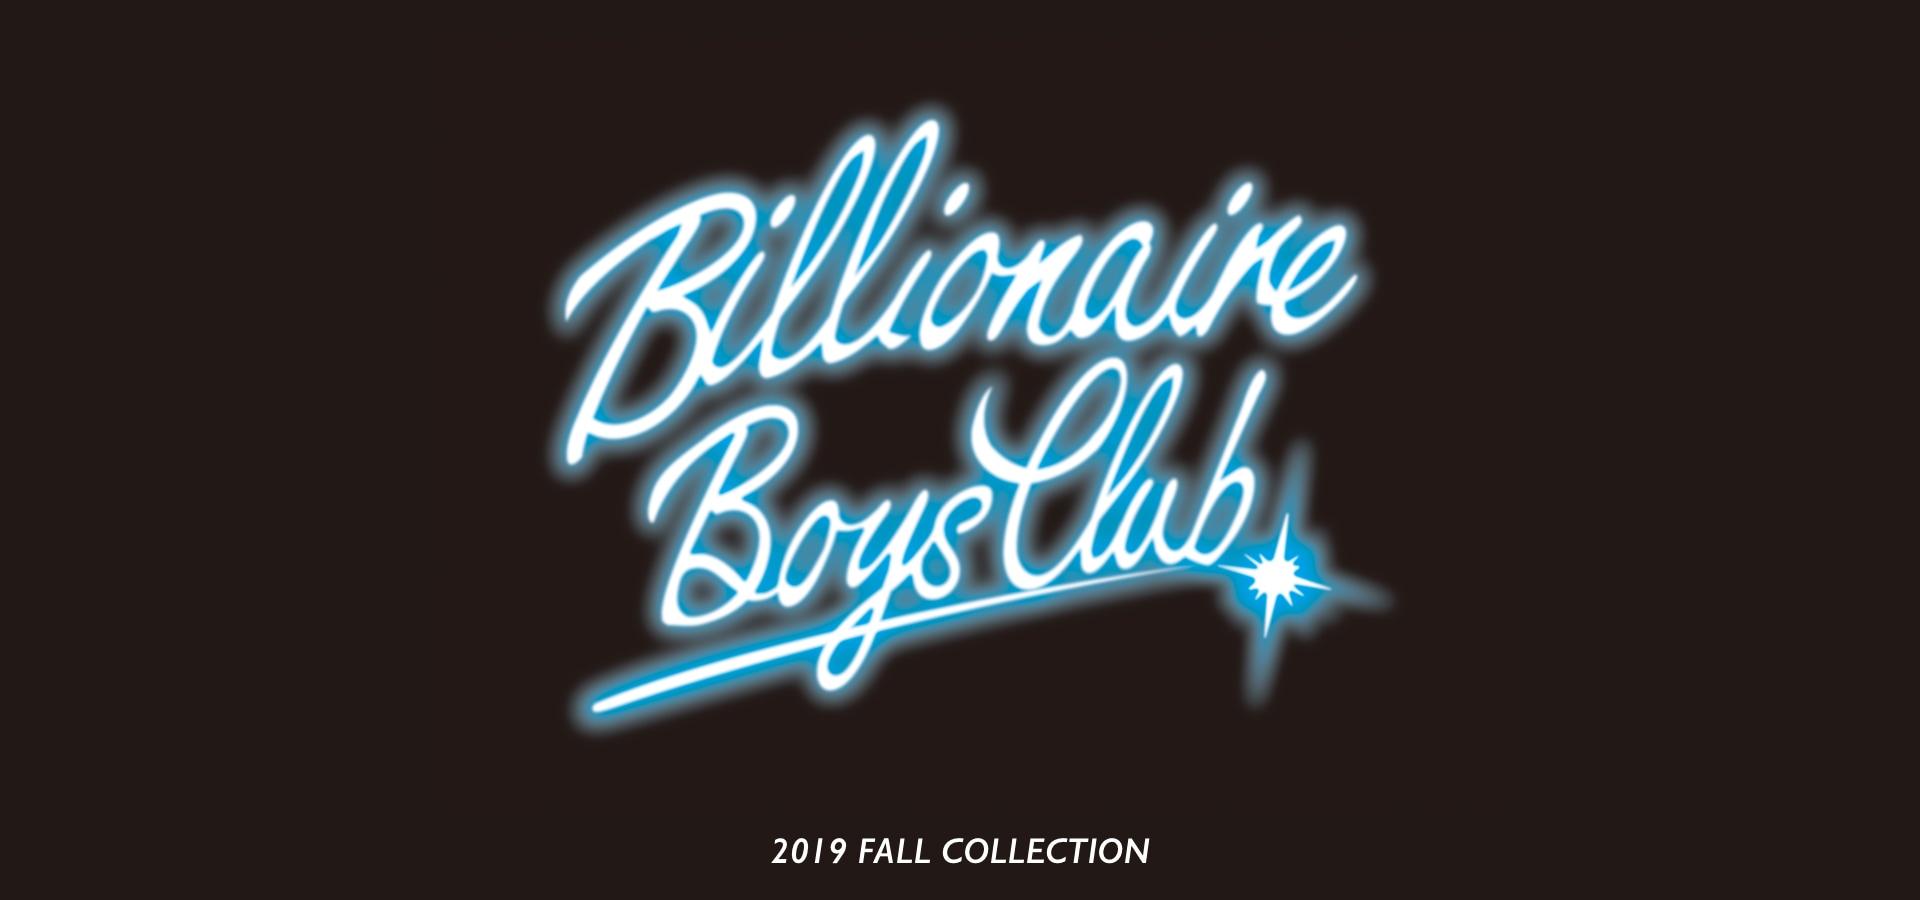 BILLIONAIRE BOYS CLUB 2019 FALL